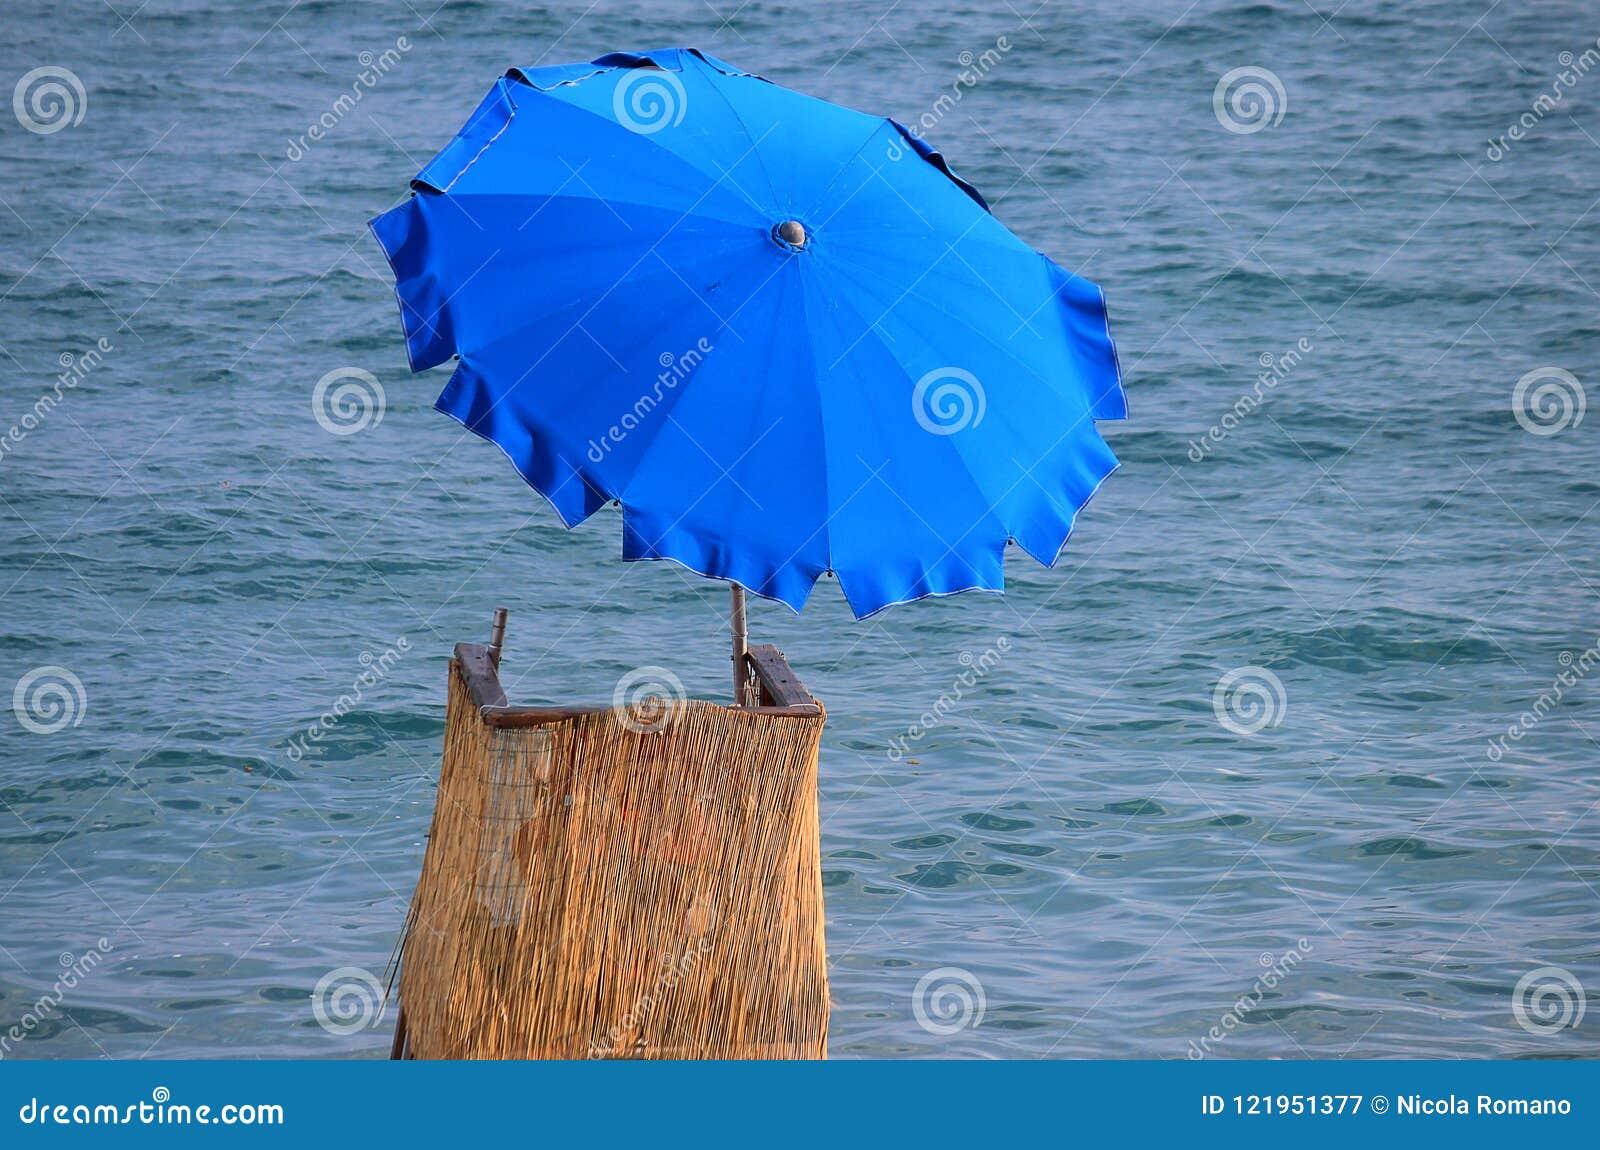 Lifeguard chair with umbrella